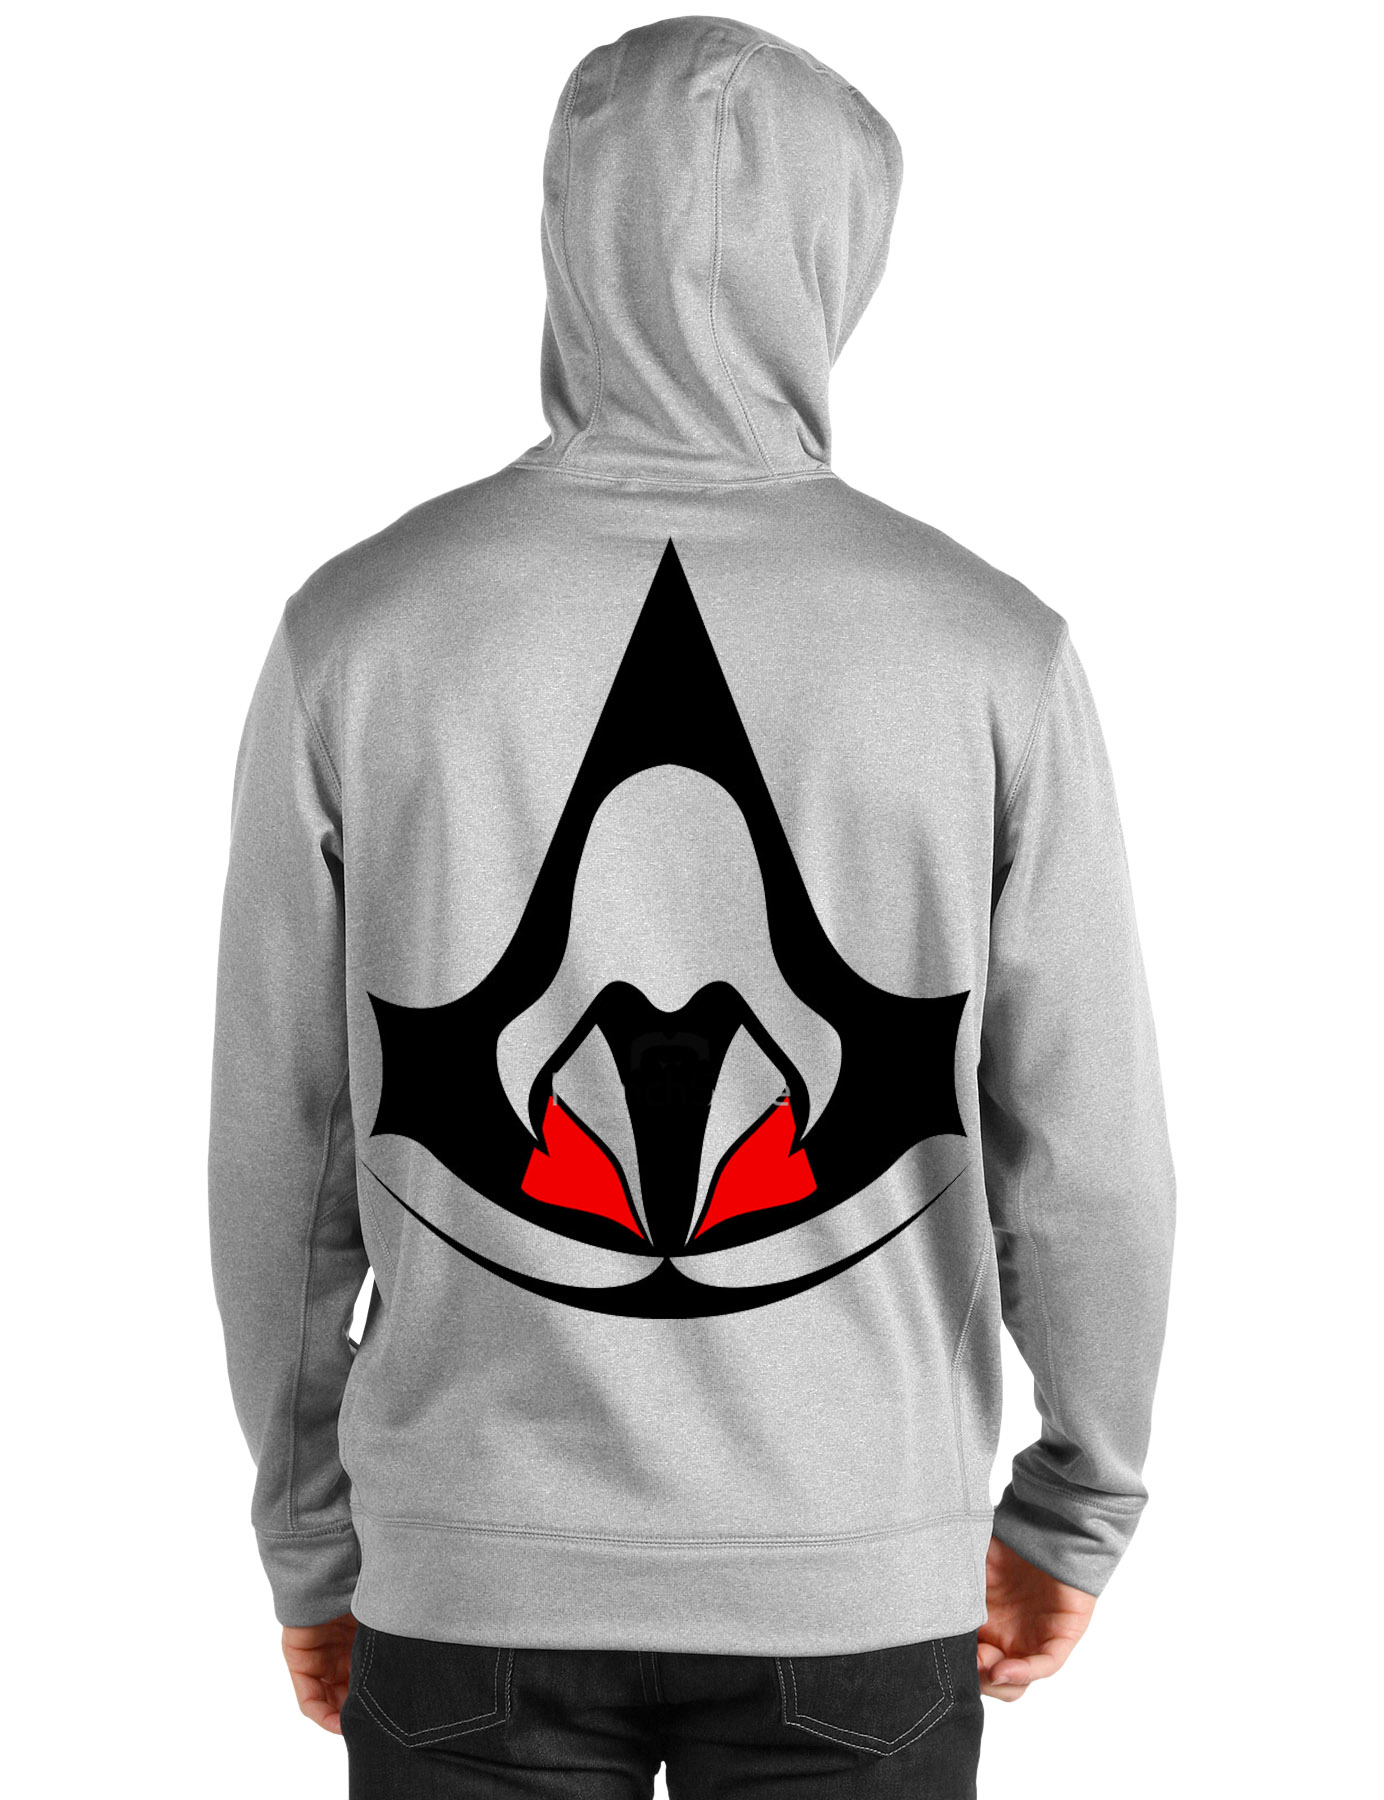 Assassins Creed Hoodies